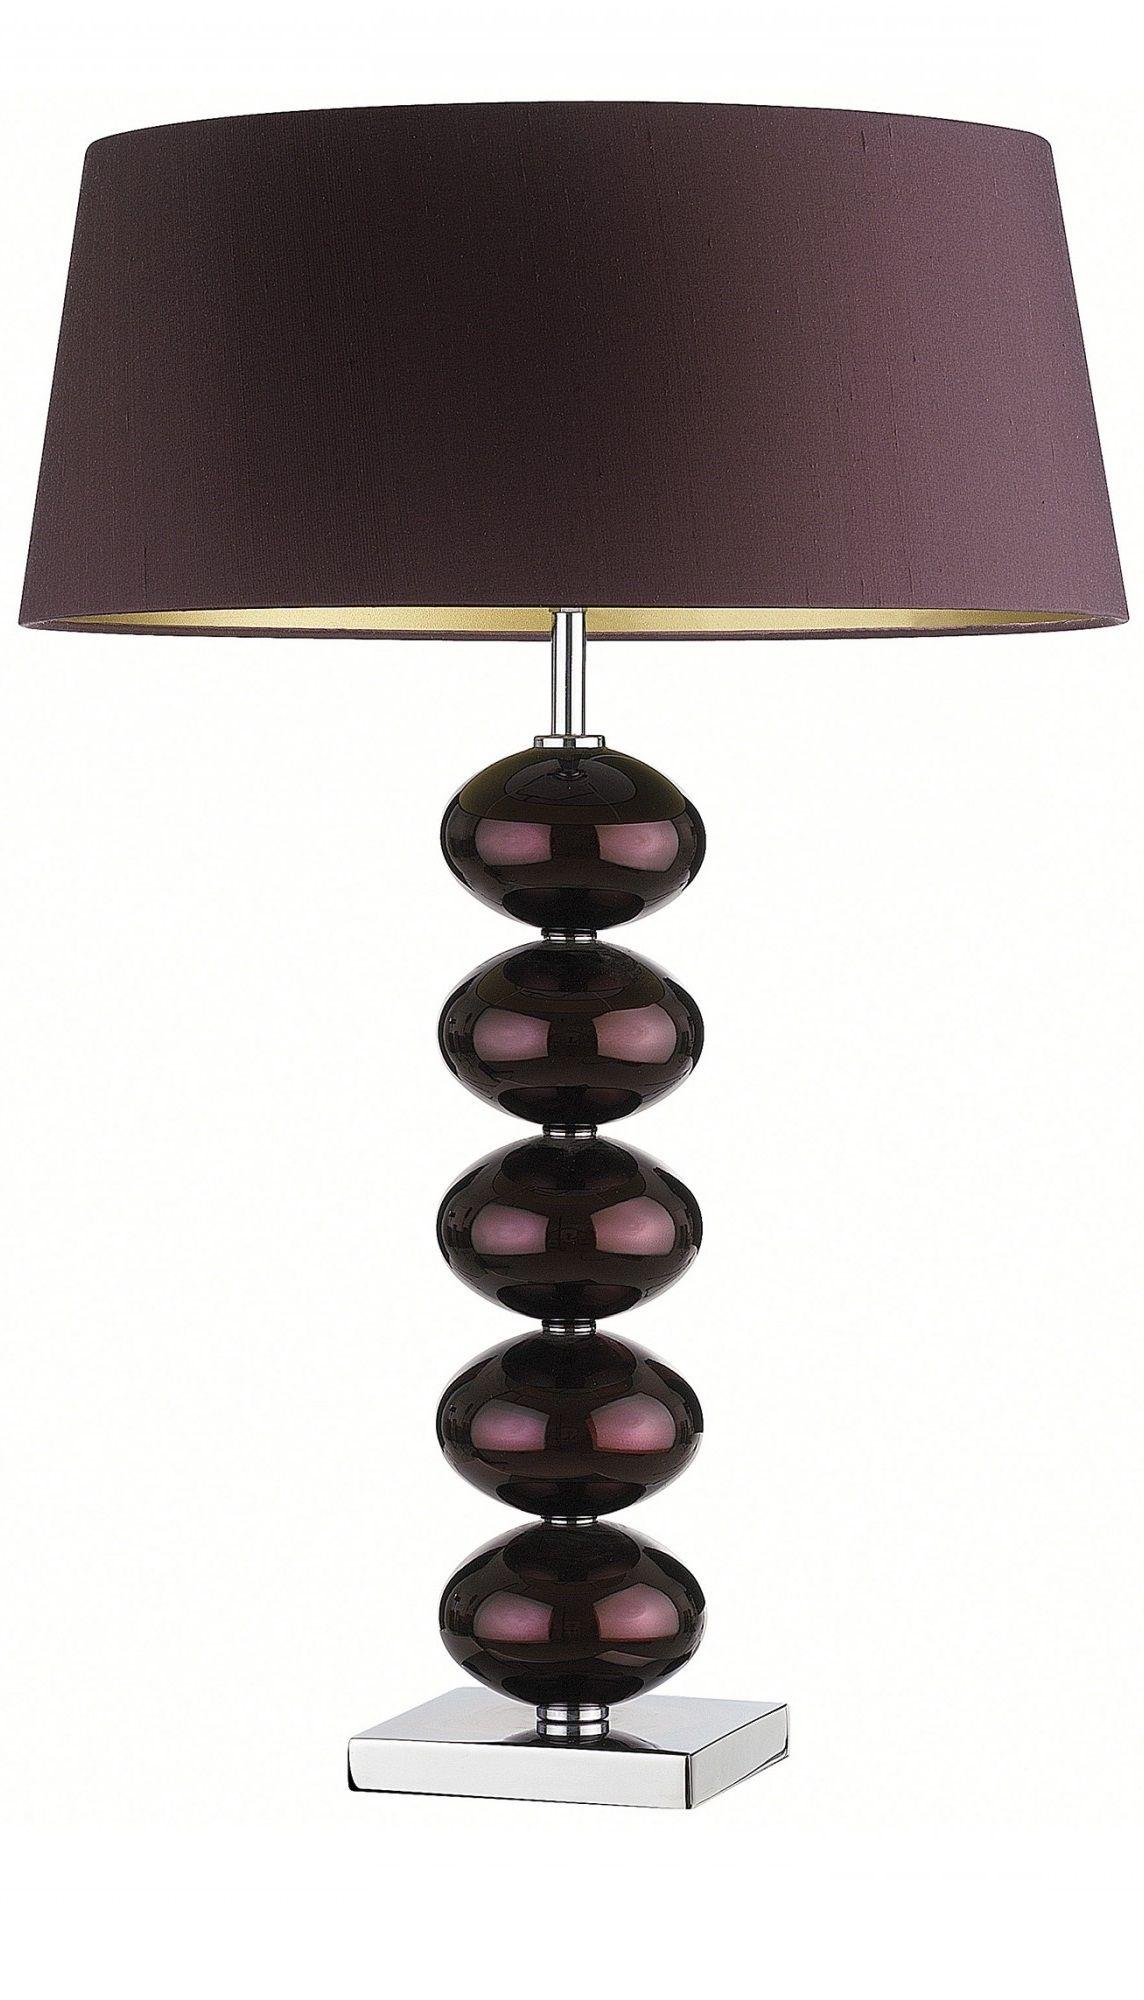 "Purple"" Purple Table Lamp, Table Lamps, Modern Table Lamps Within Purple Living Room Table Lamps (#14 of 15)"